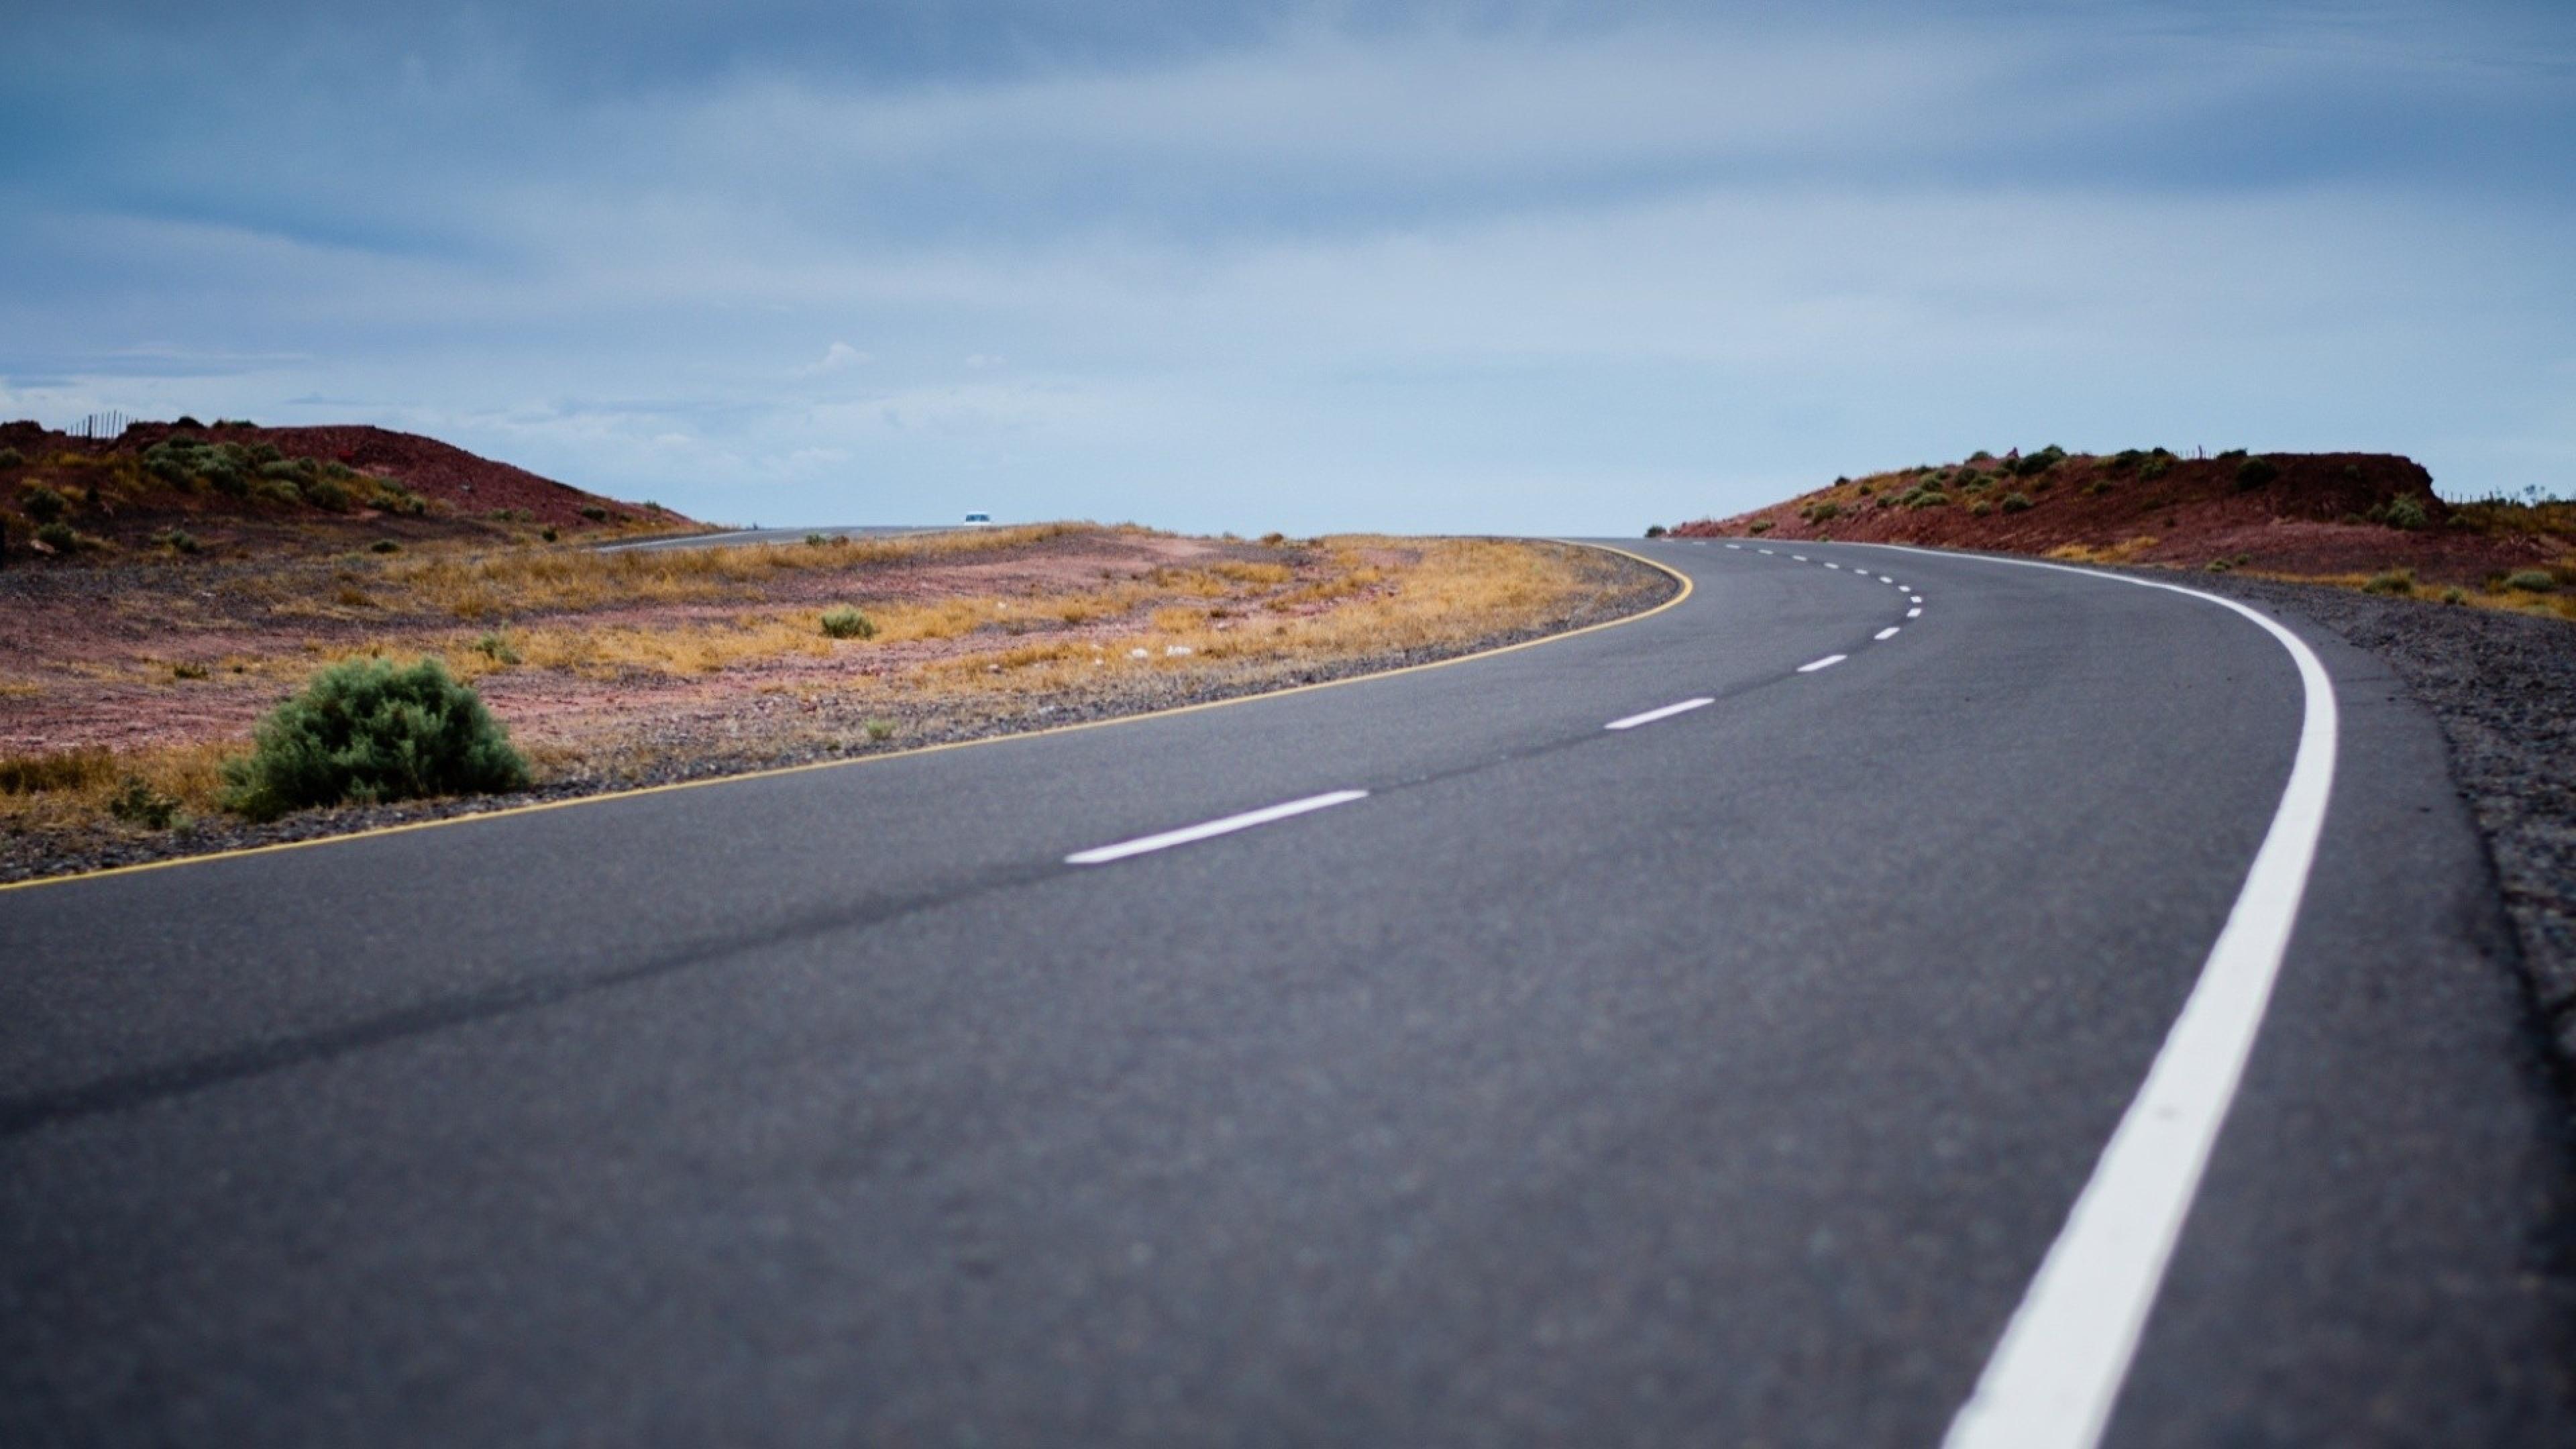 HQ Road Wallpapers | File 1611.27Kb